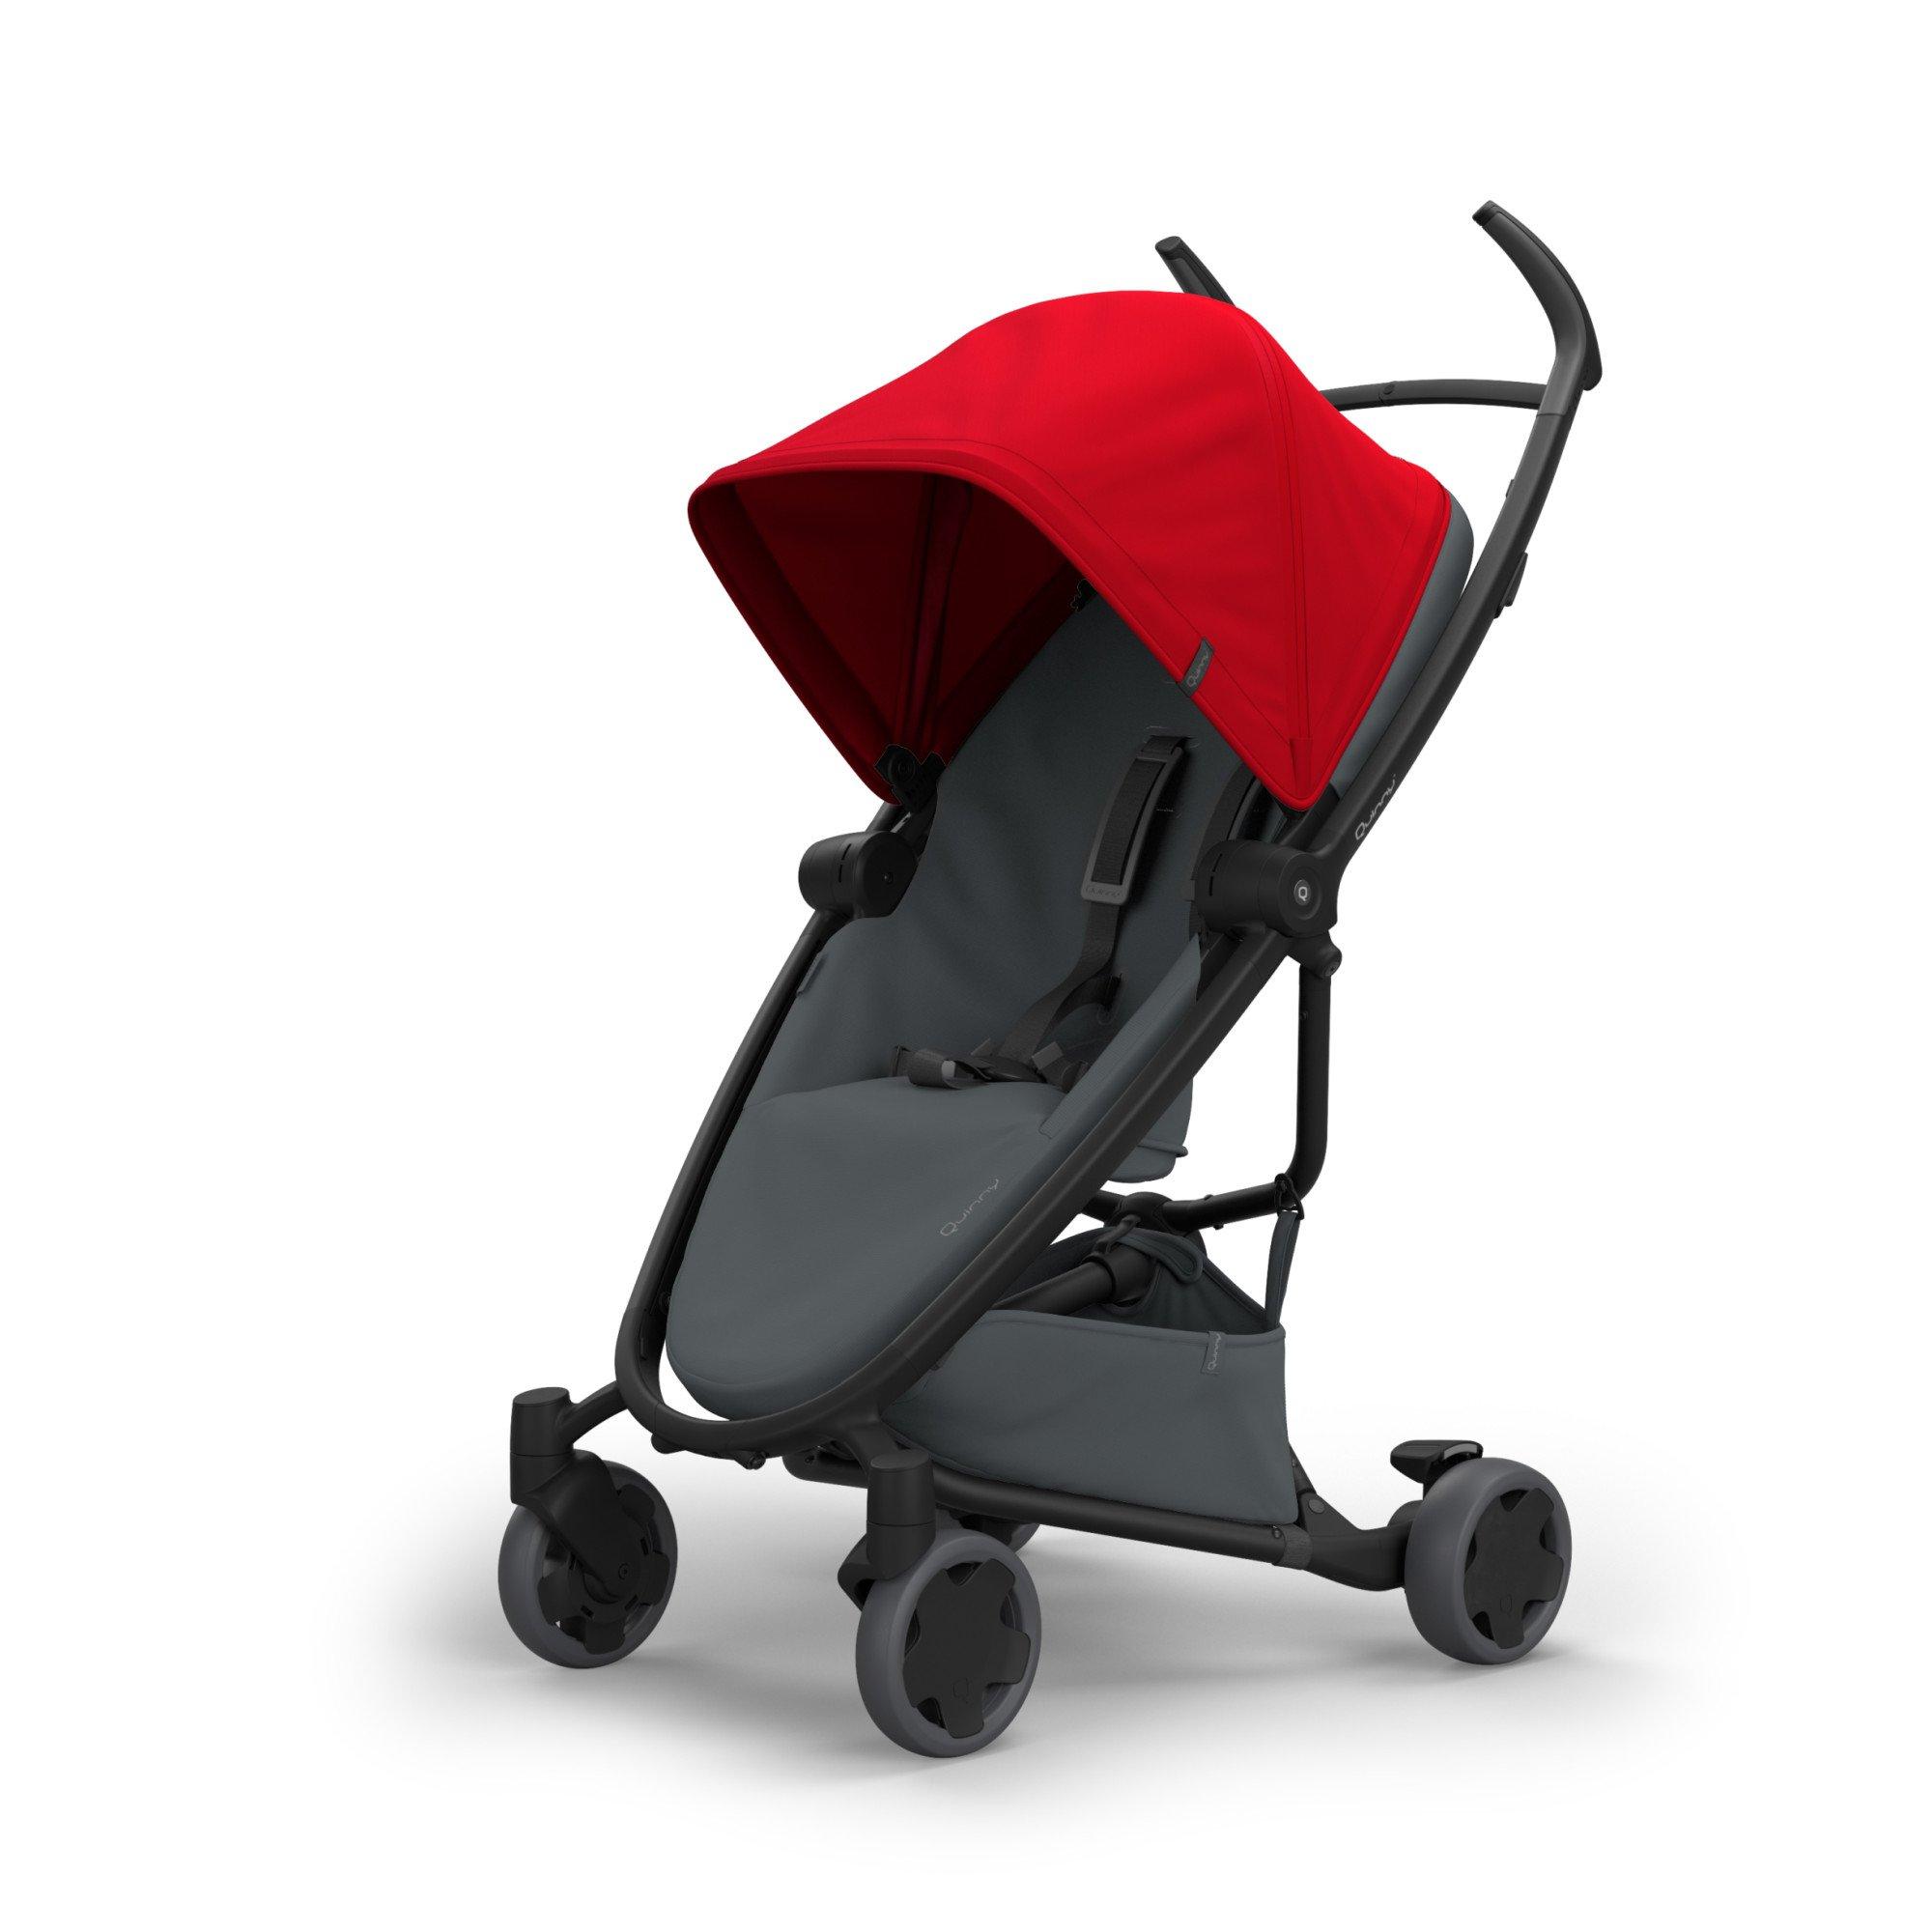 Quinny Zapp Flex Stroller, Red by Quinny (Image #1)